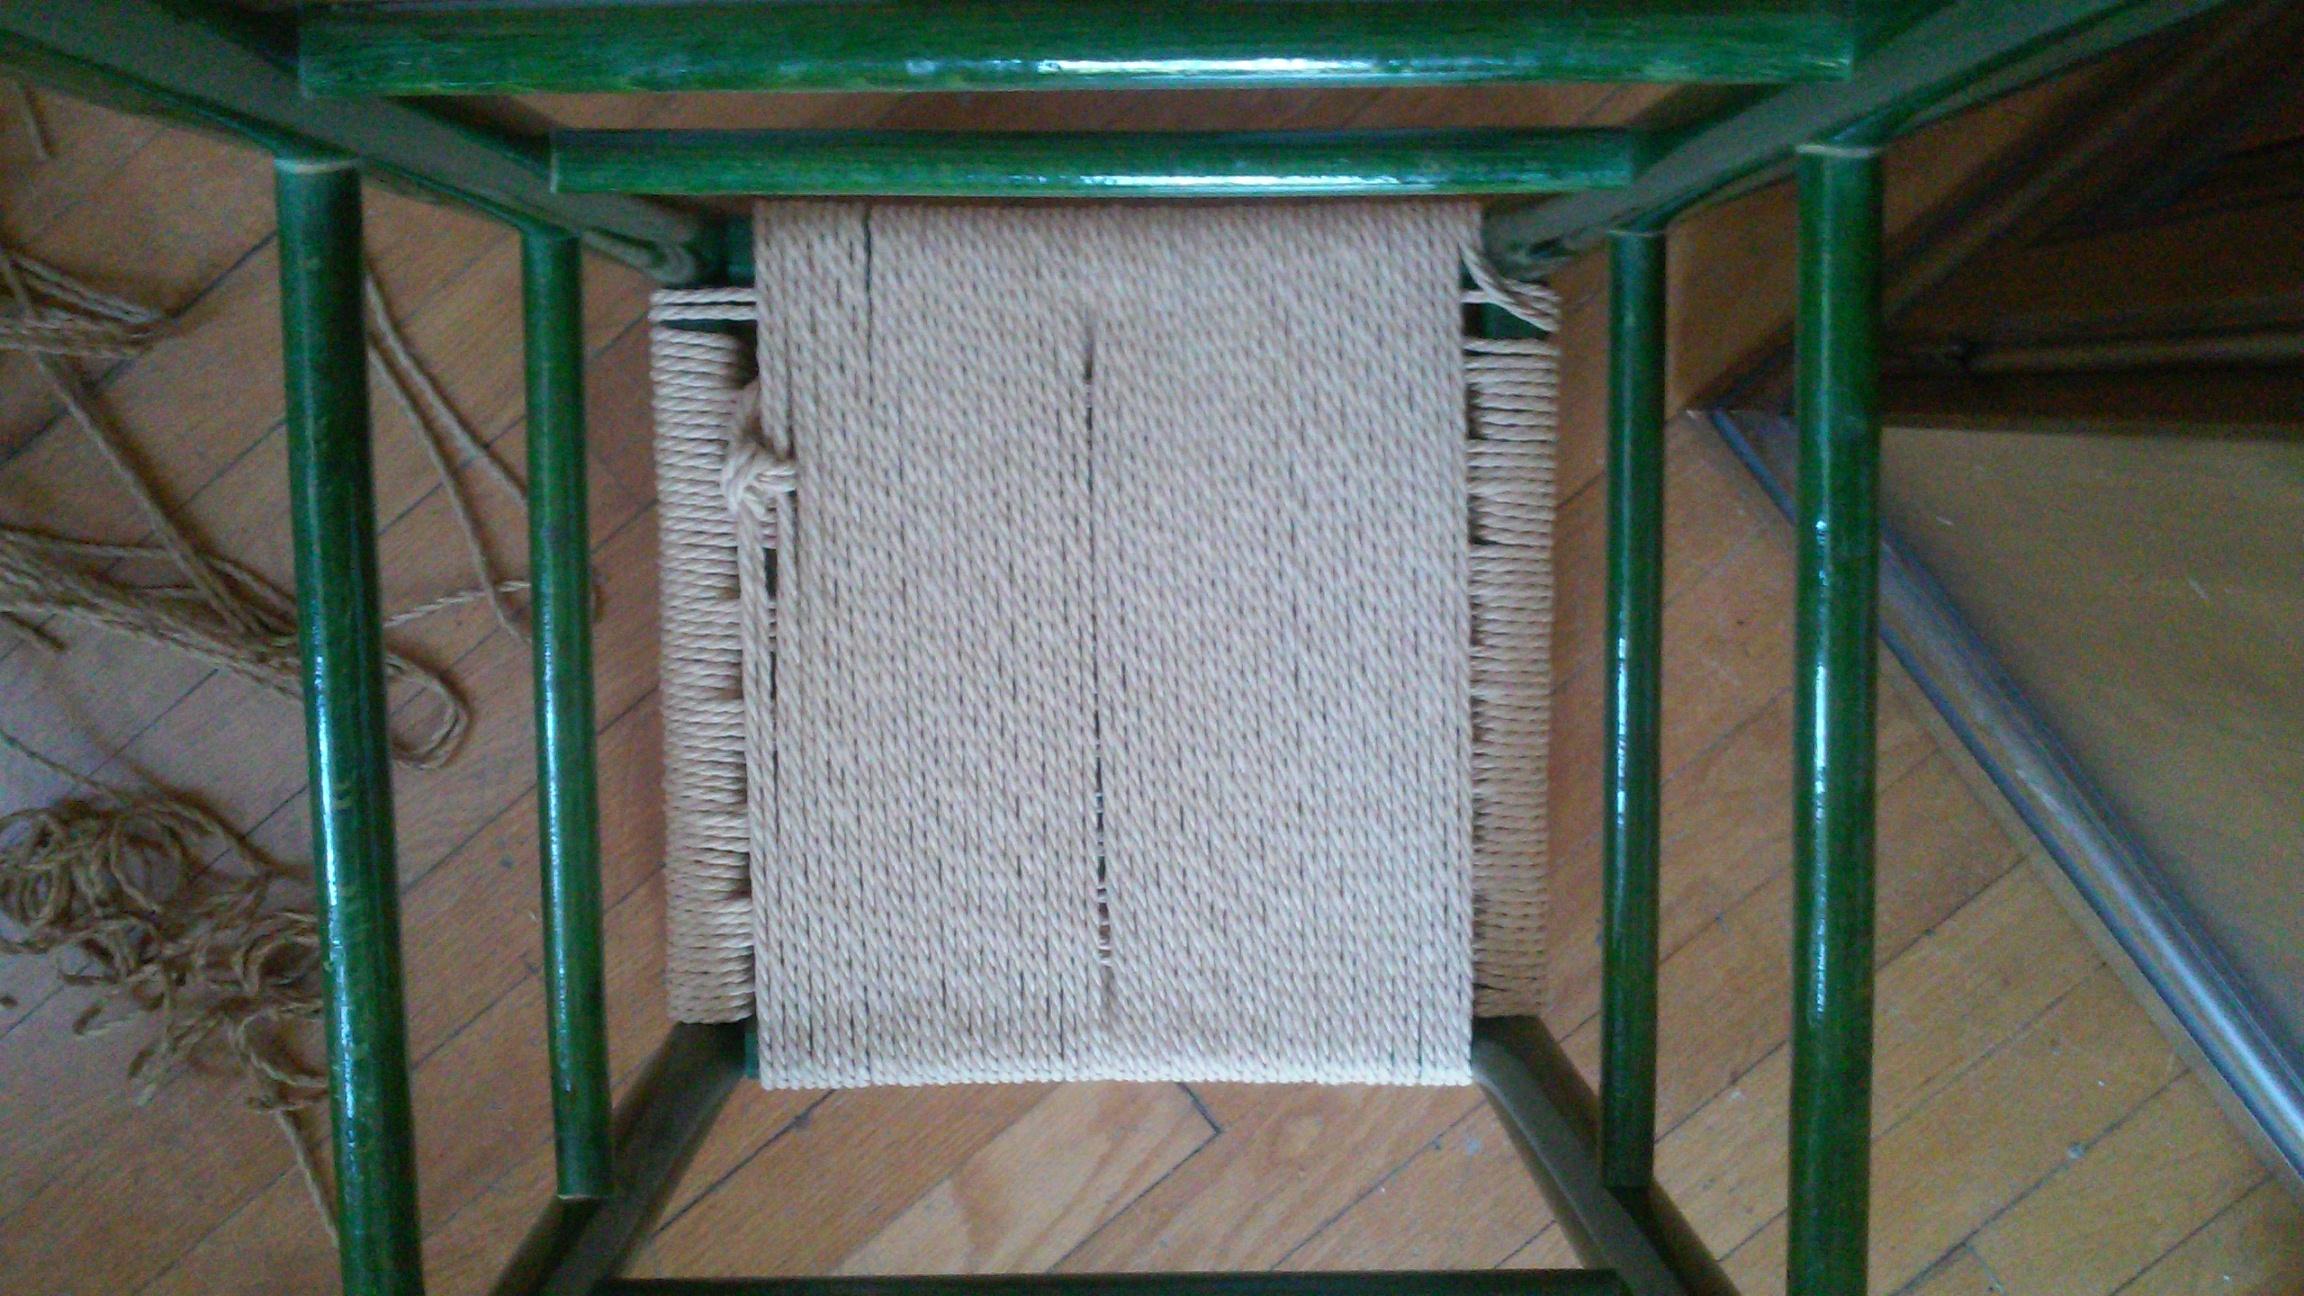 Underside off the Danish Cord stool